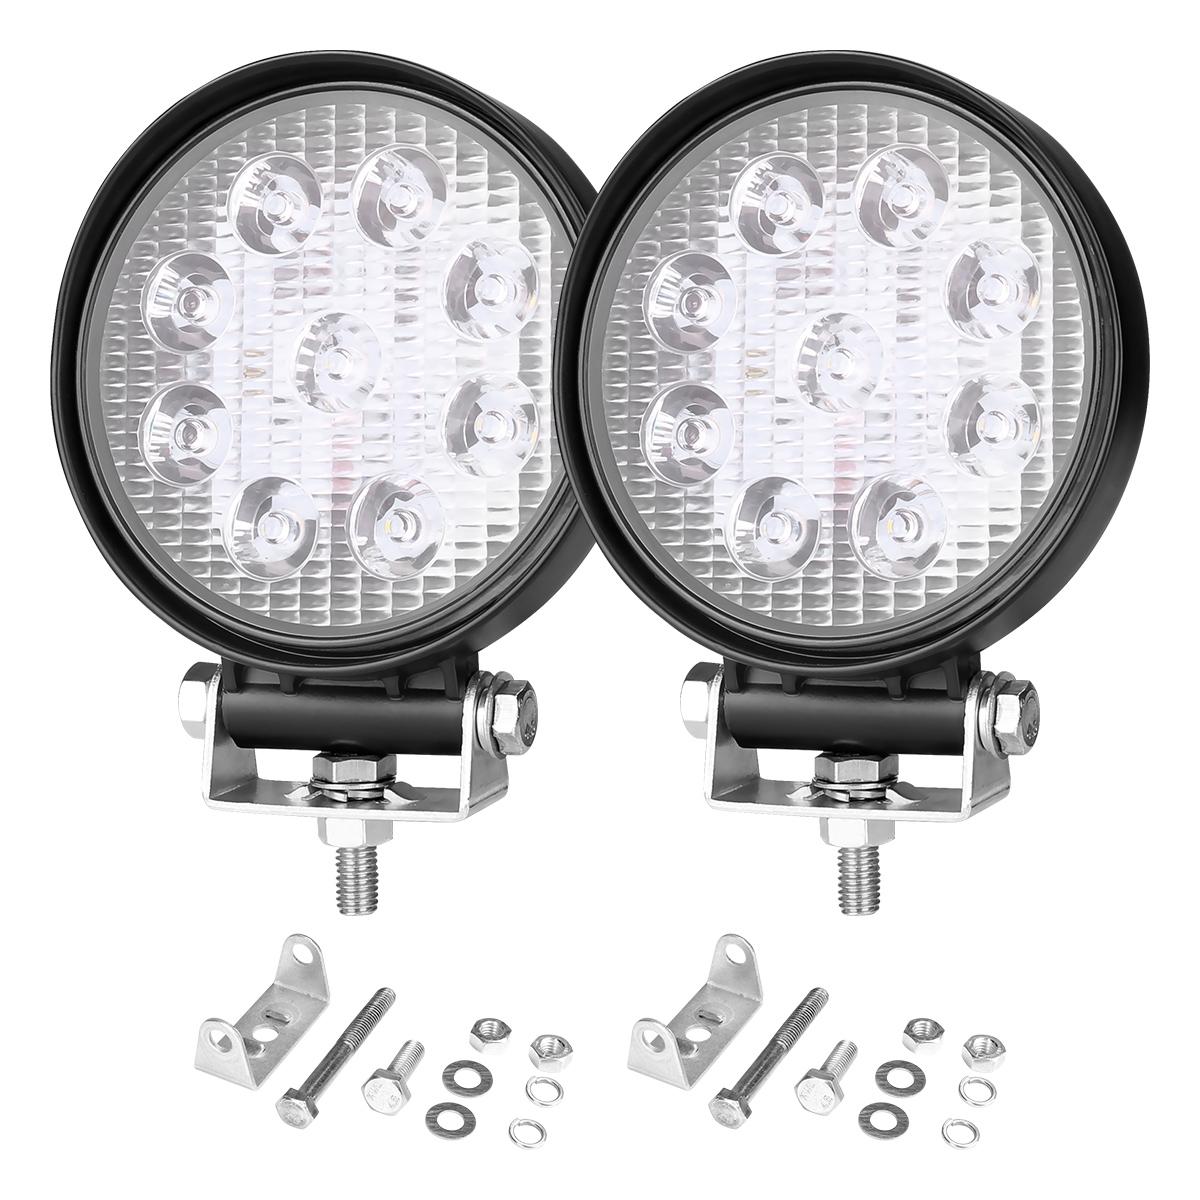 27W 1800 Lumens Off Road LED Headlights, Cree and IP67